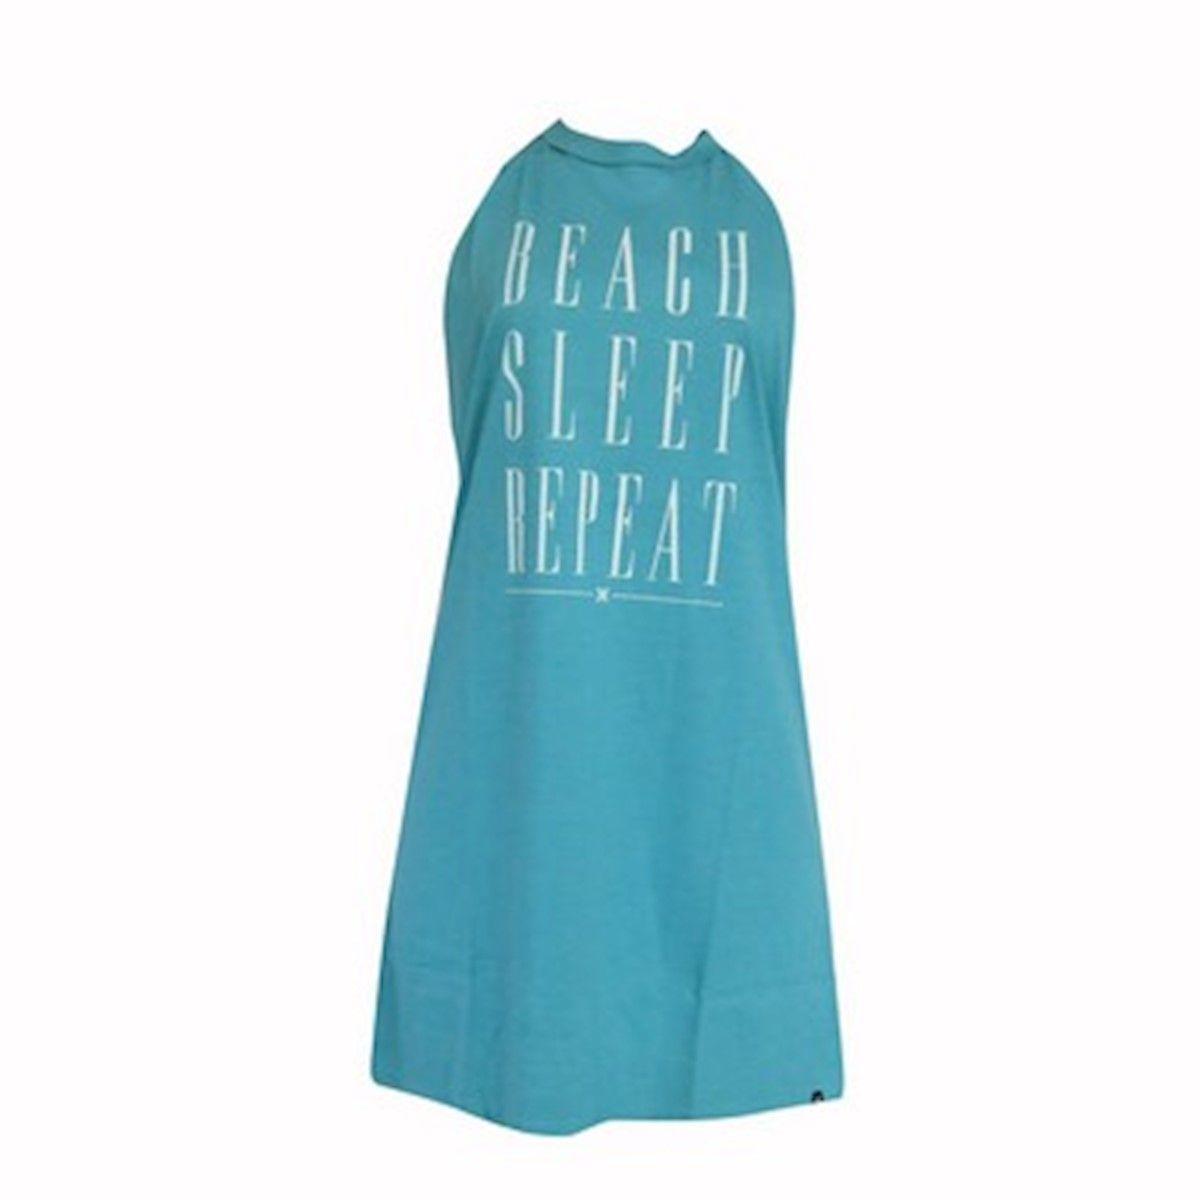 Vestido Hurley Beach Sleep Repeat